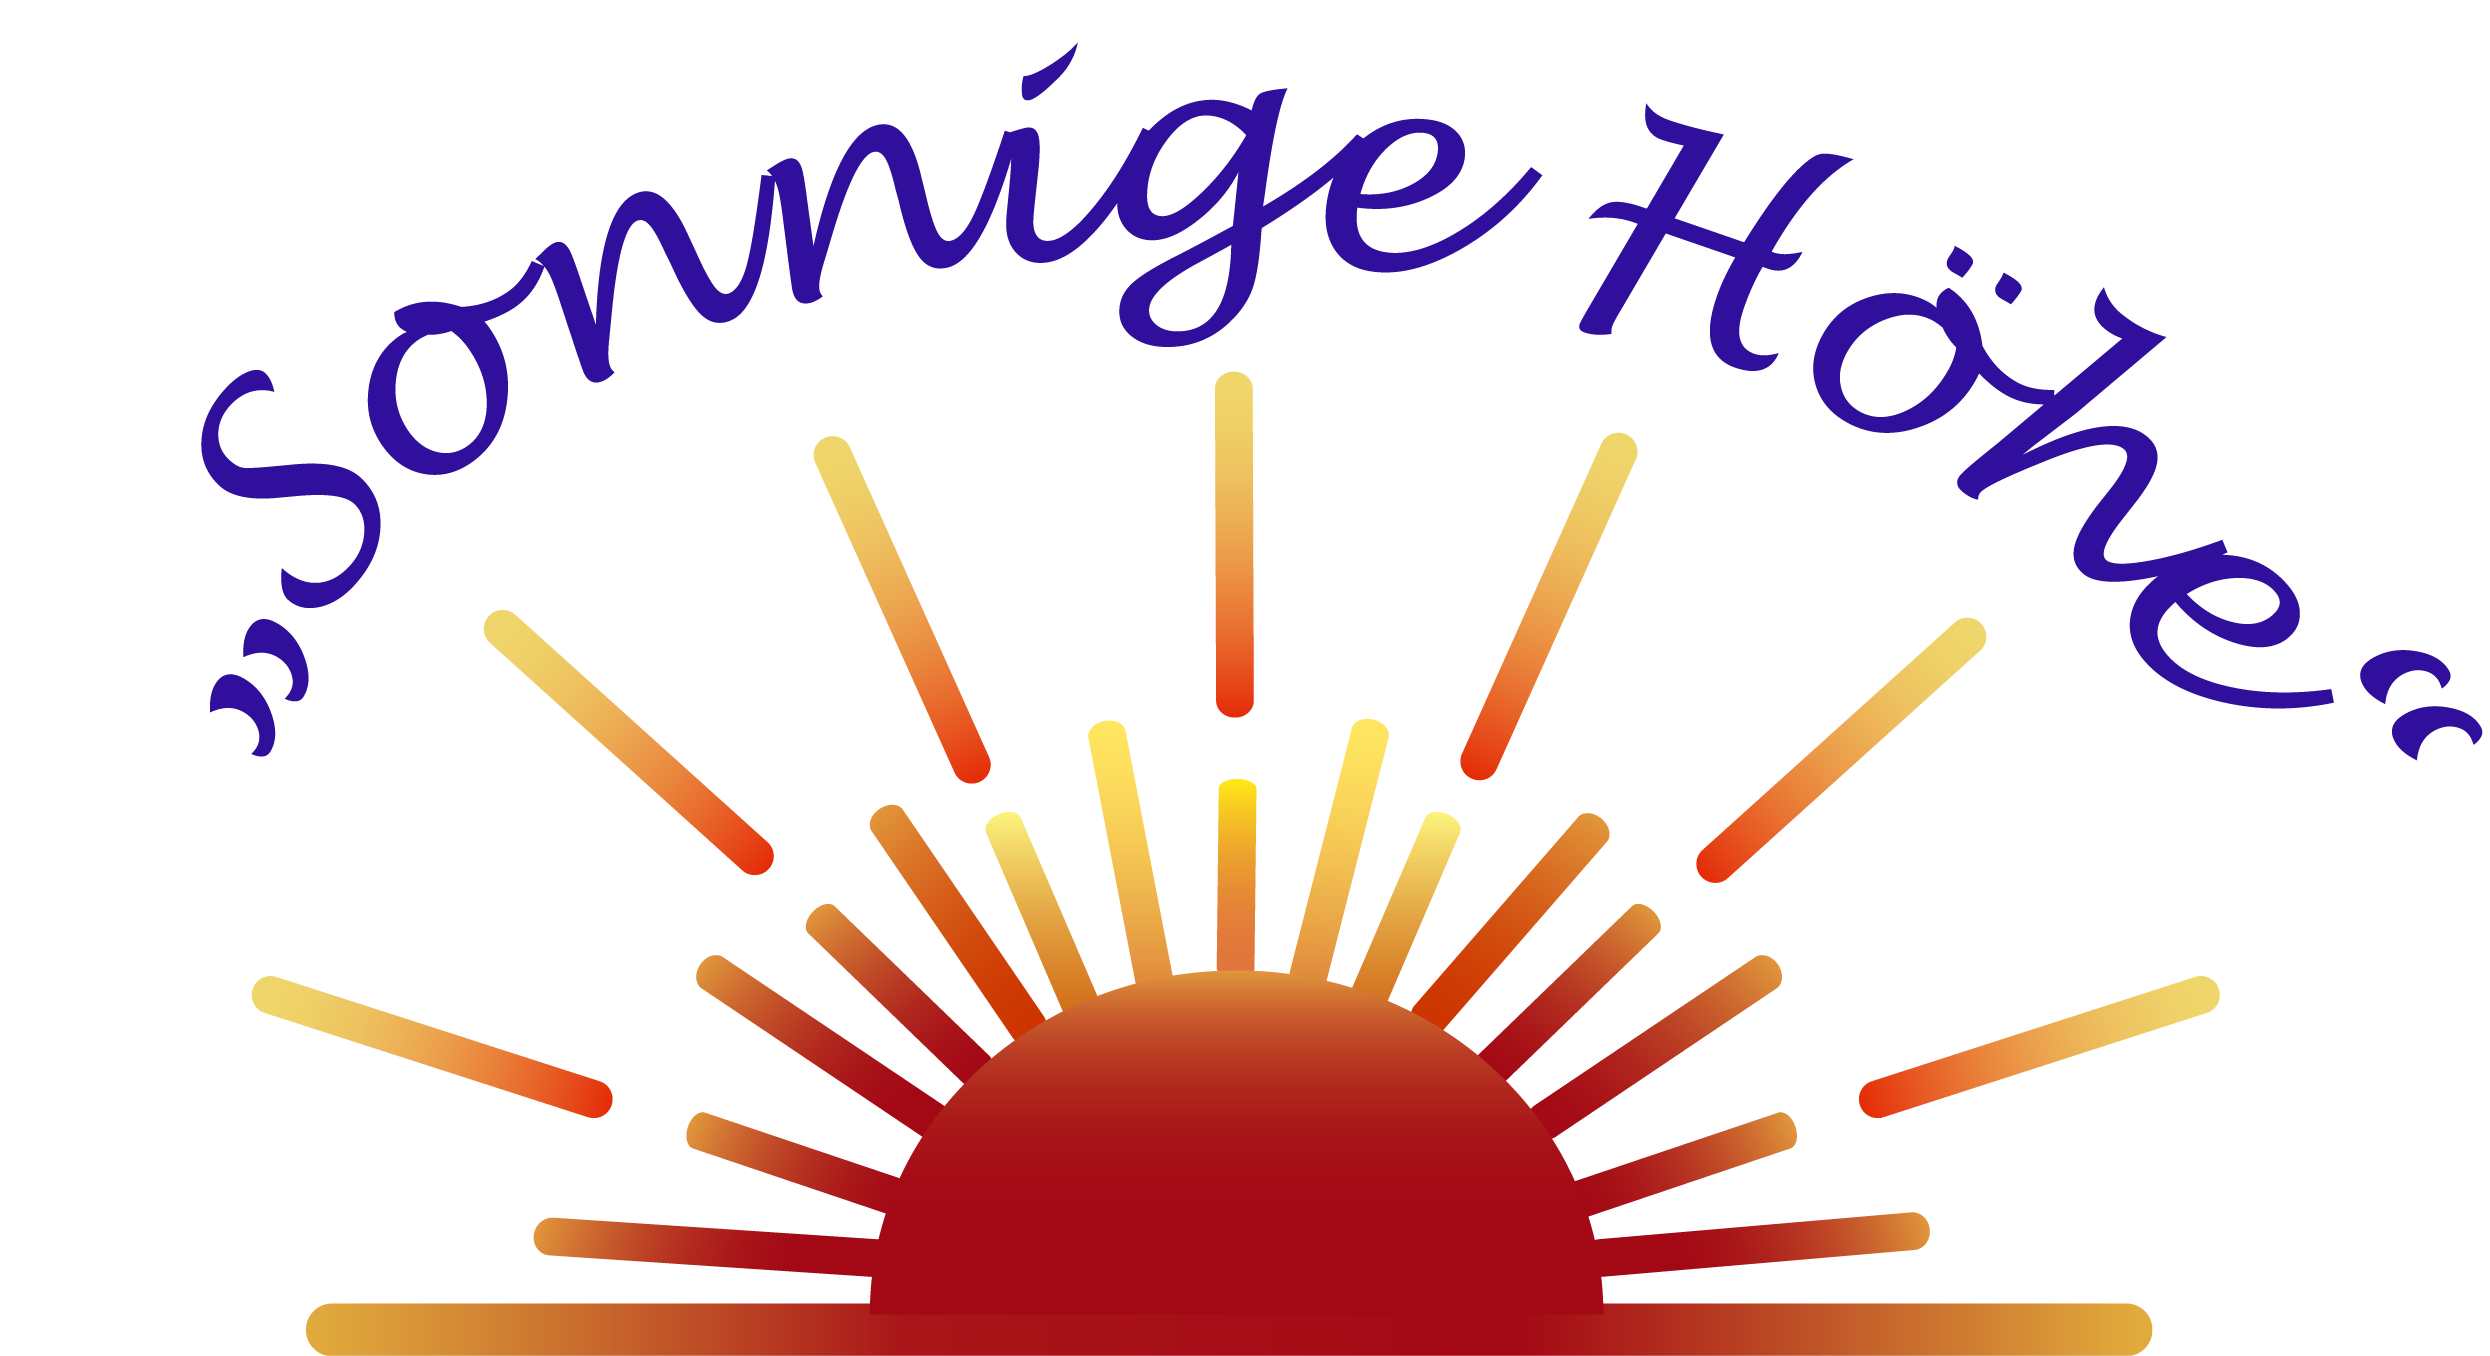 """Sonnige Höhe"" e.V."